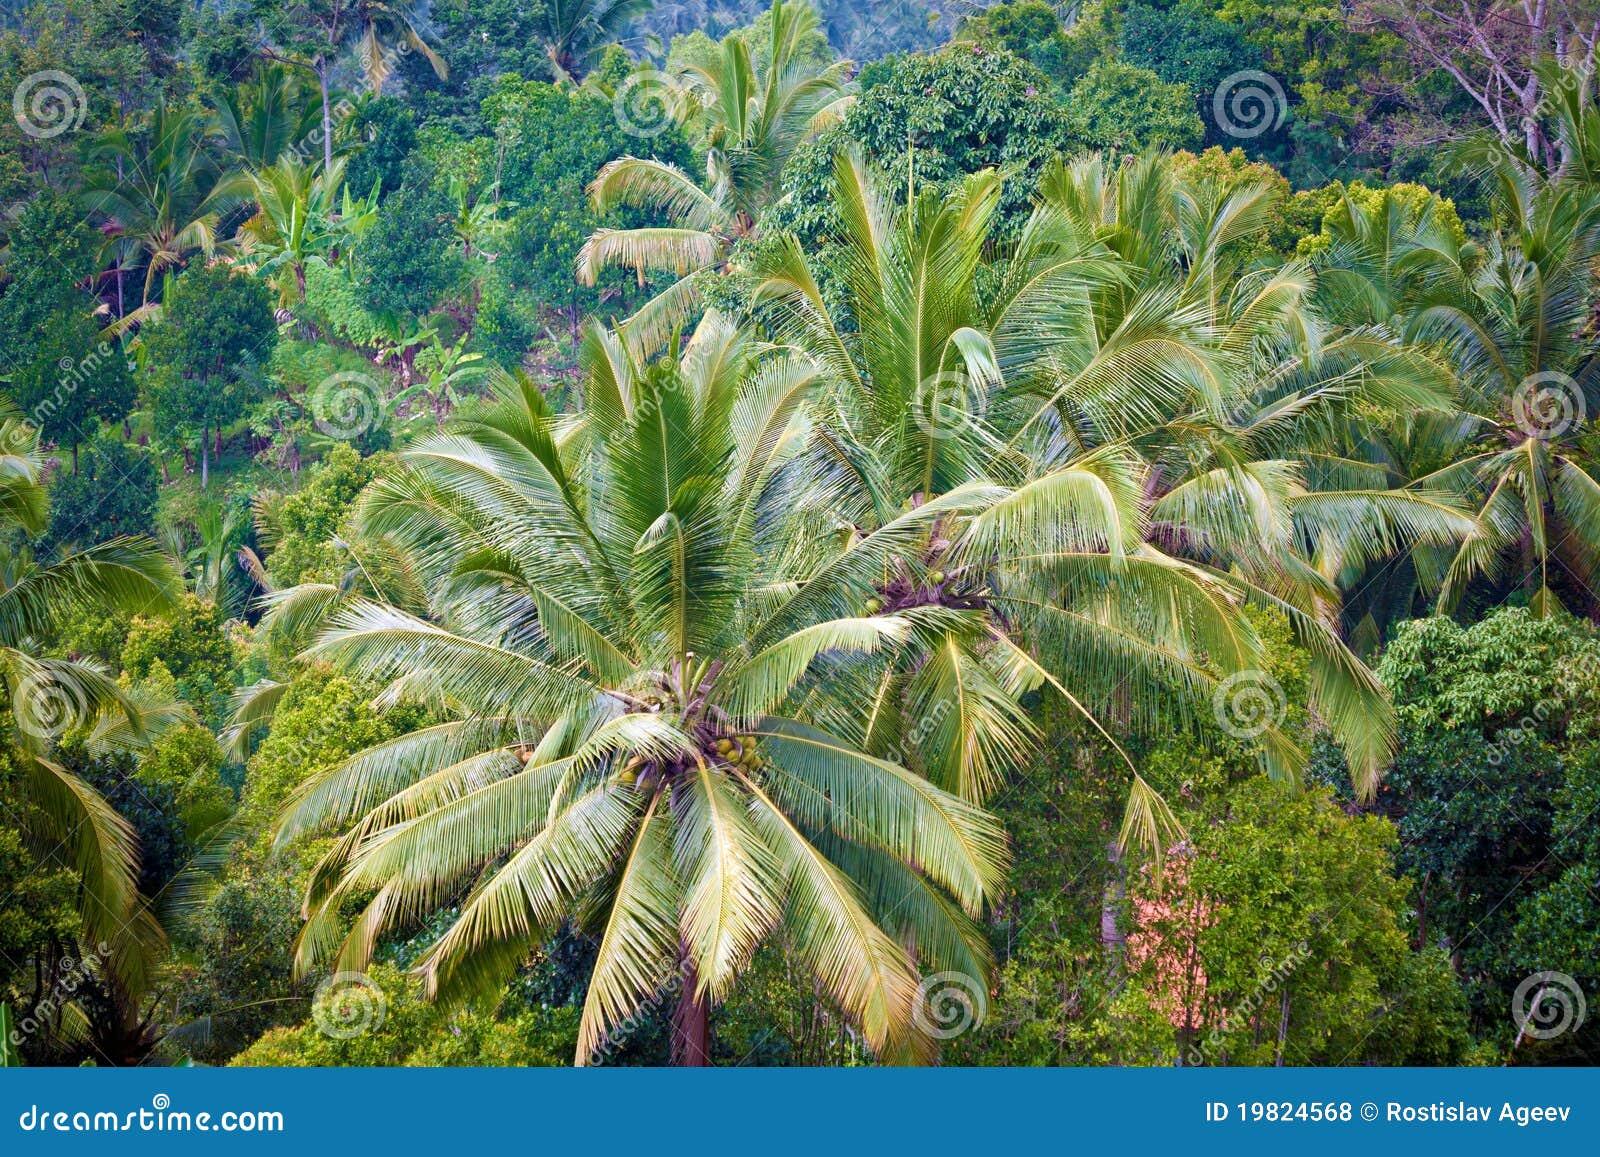 Dschungel Dschungel